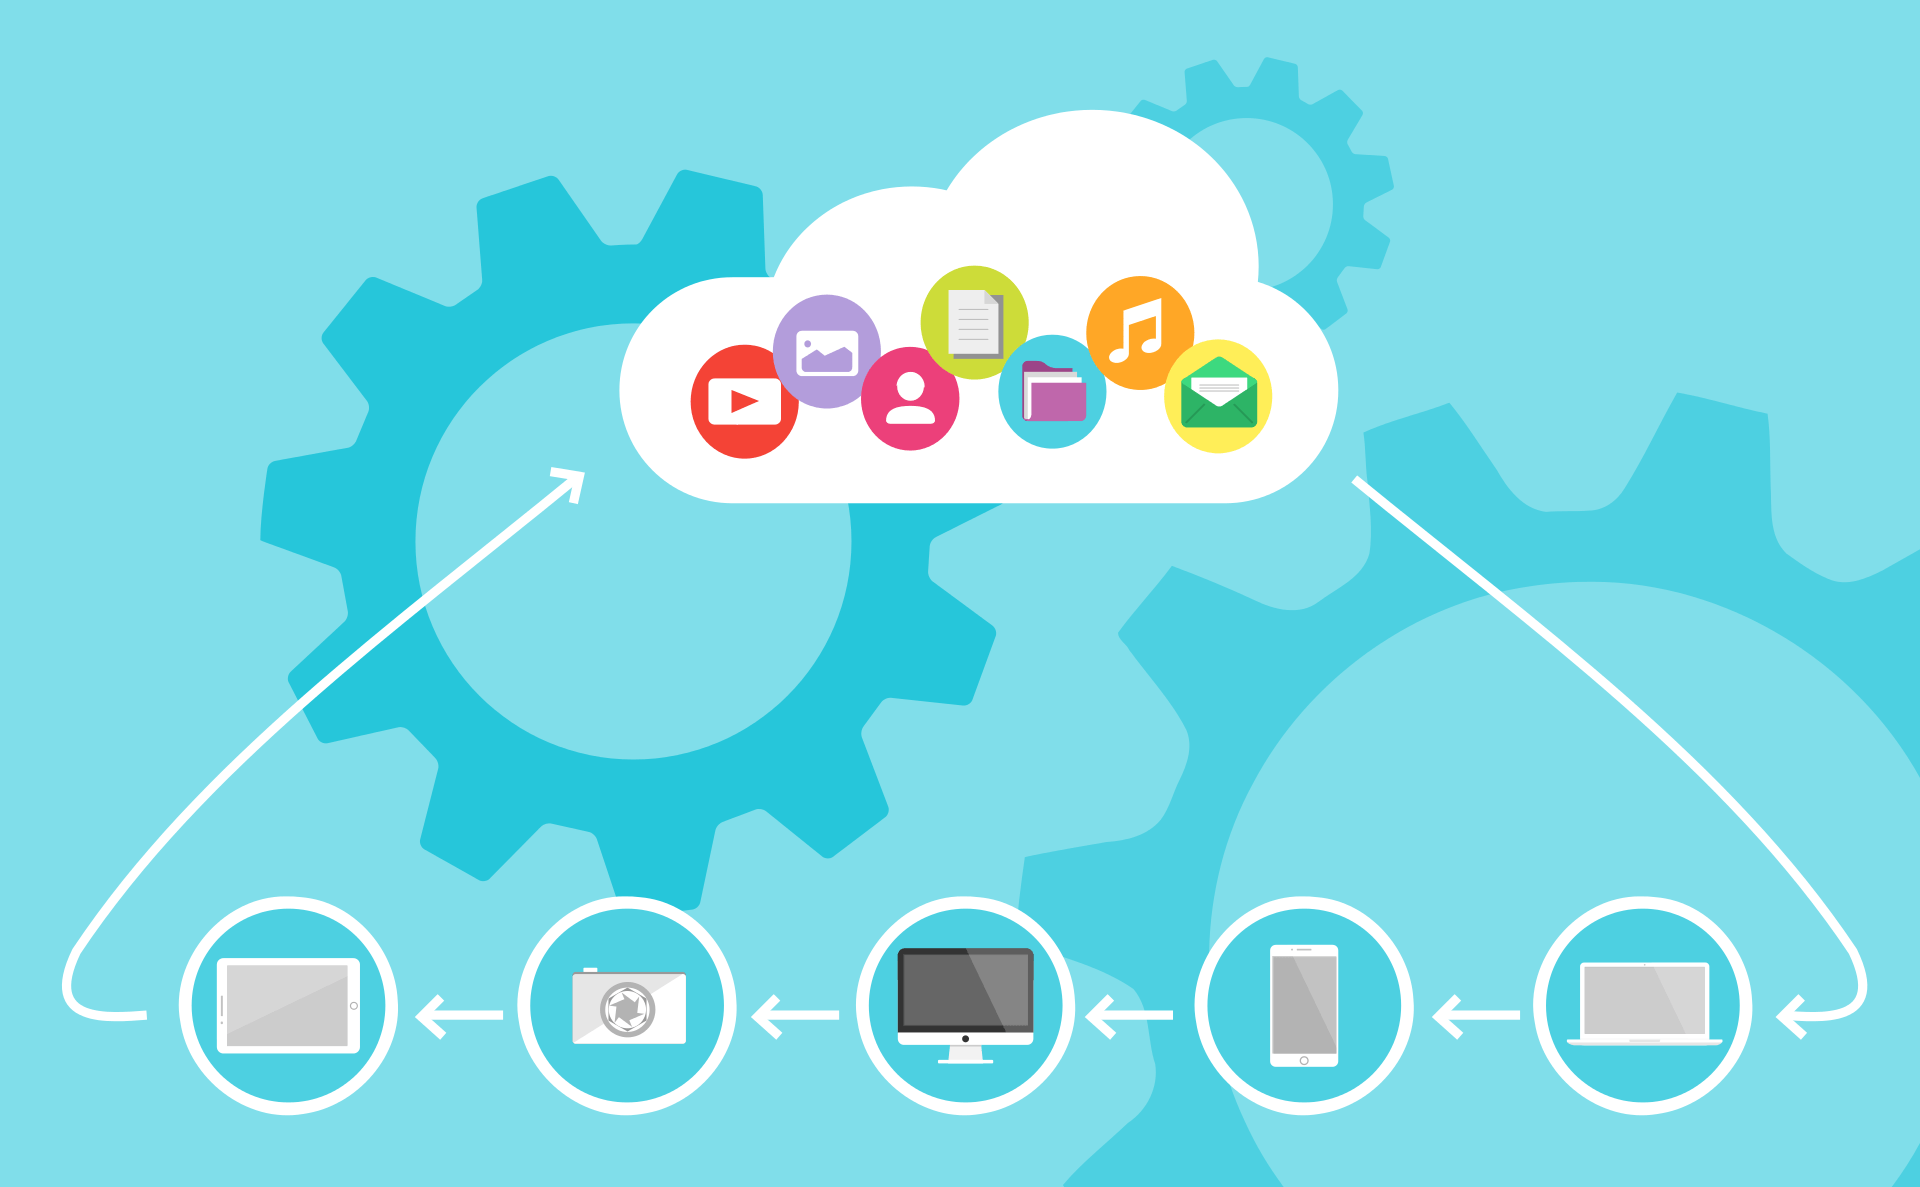 Cloud computing training & certification